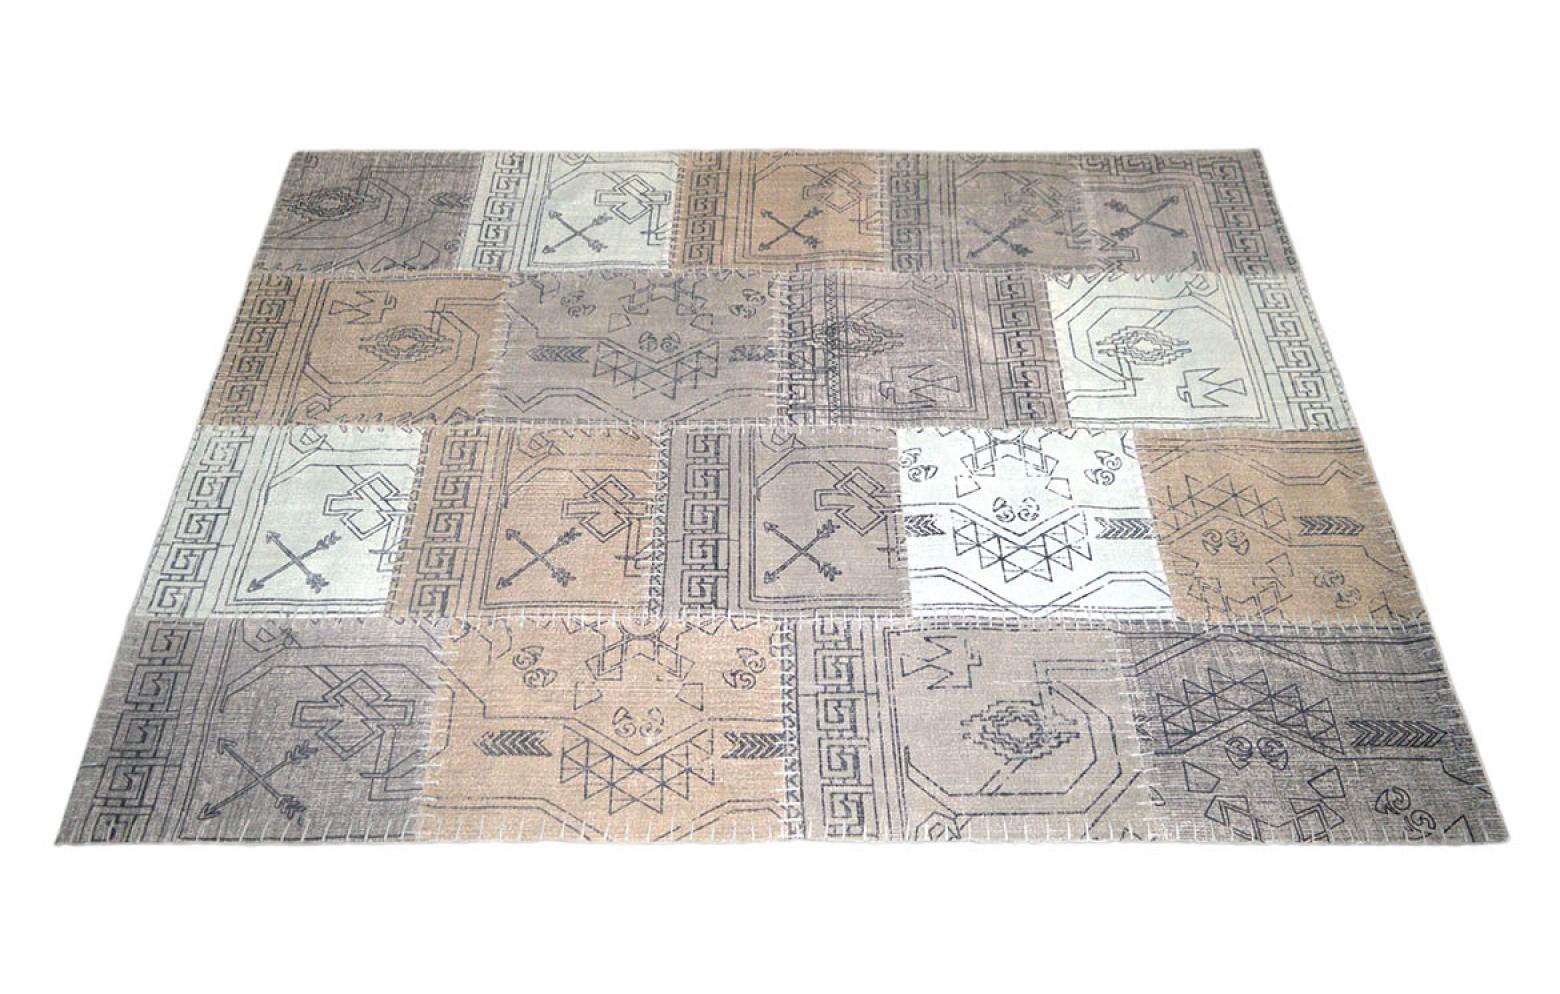 egypt 200x300 teppich kissen teppiche online outlet who 39 s perfect. Black Bedroom Furniture Sets. Home Design Ideas